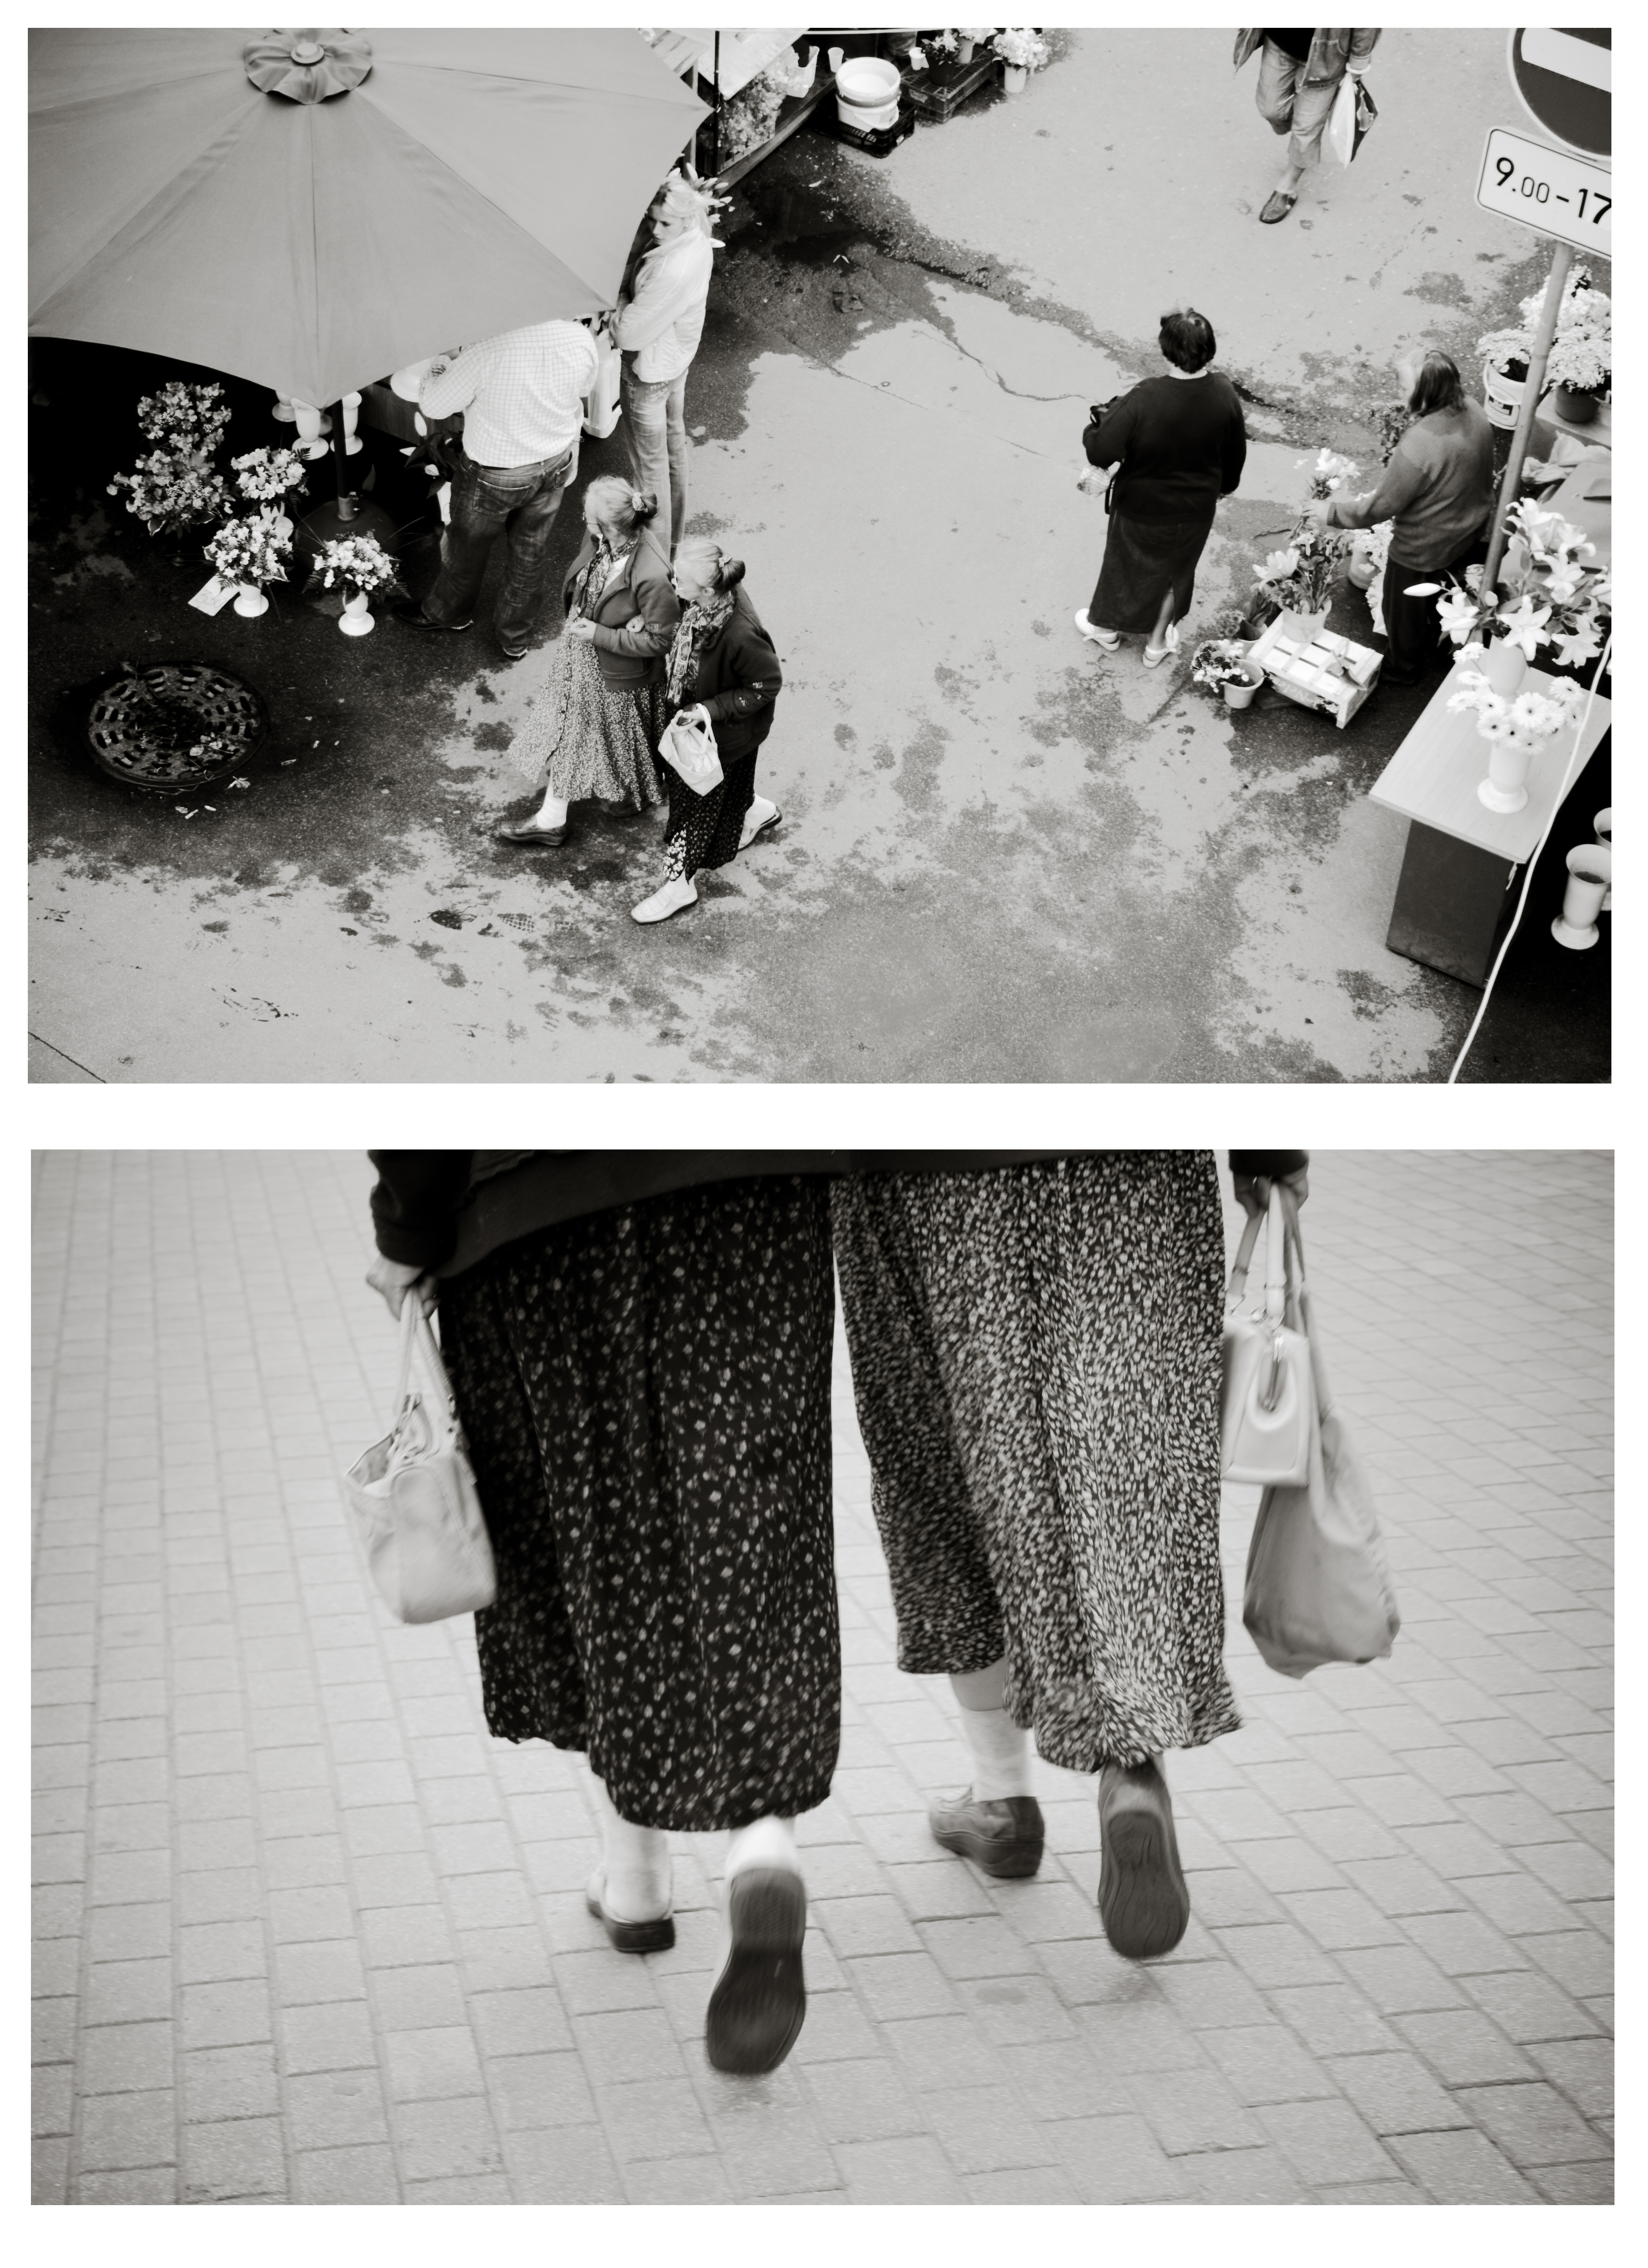 image - Flickr / yesfuture